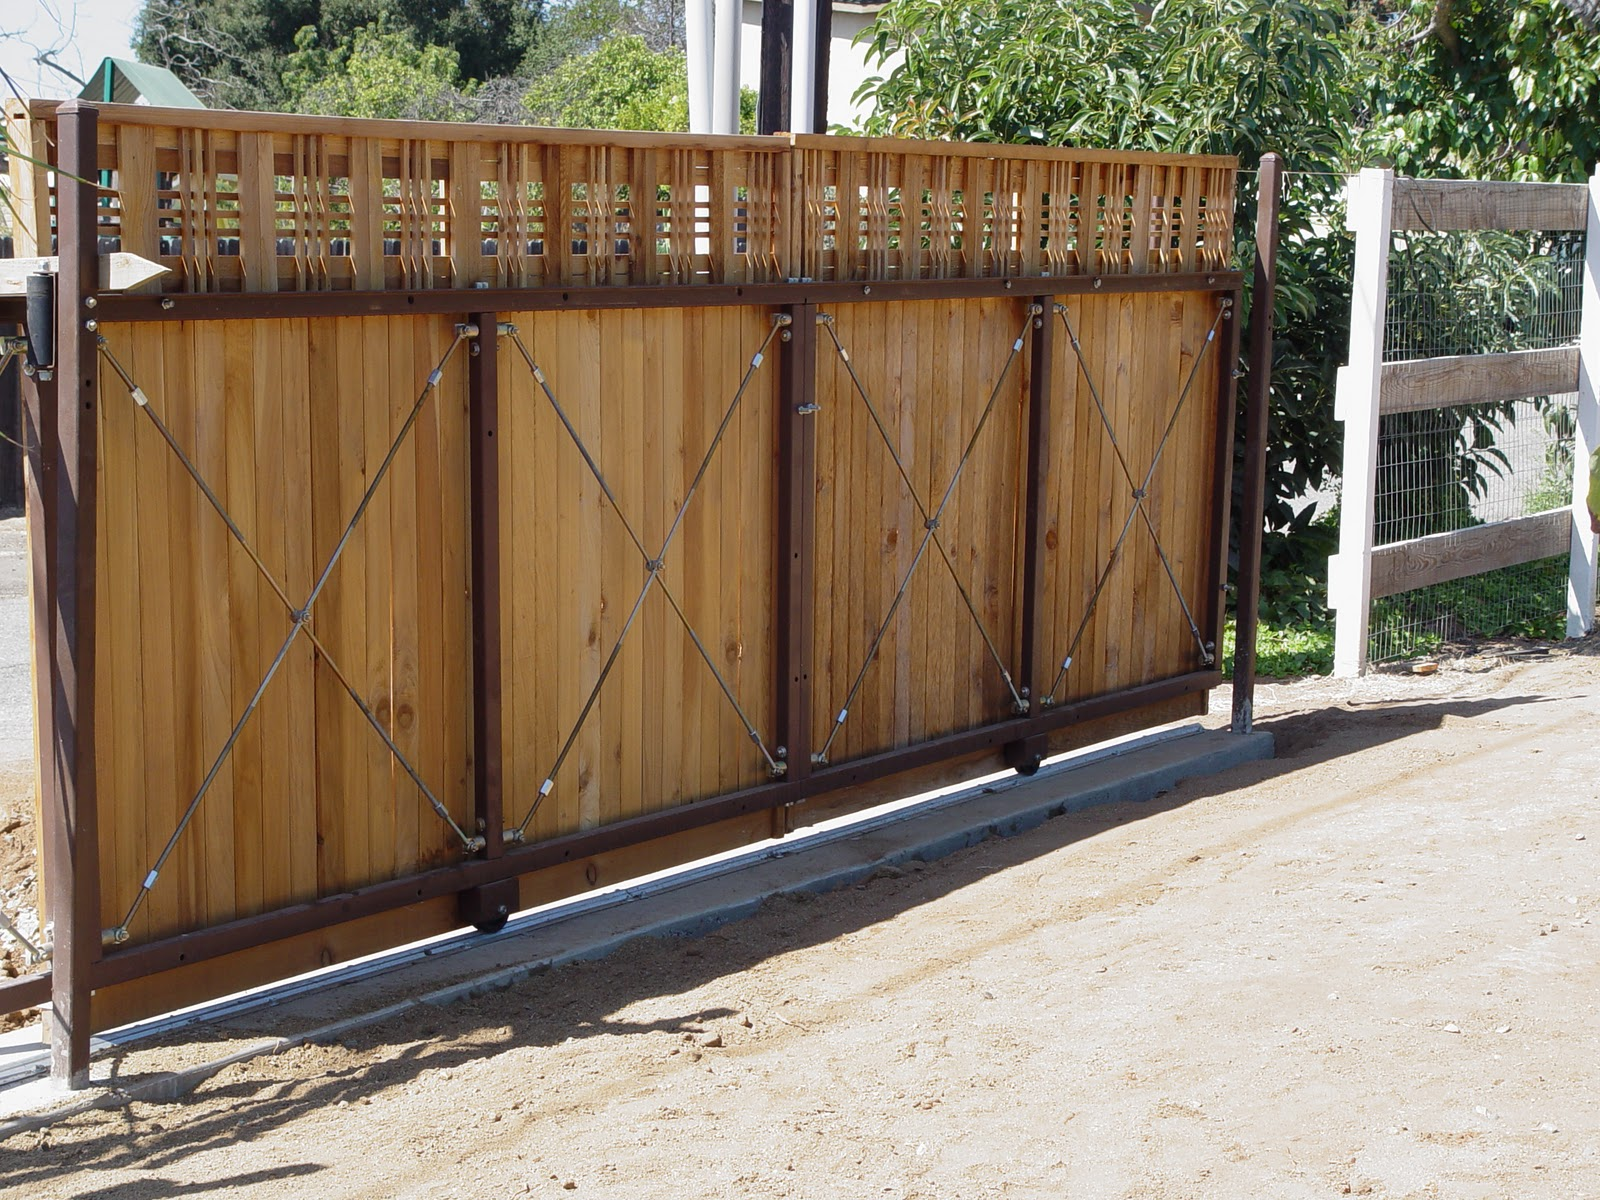 Driveway Gate Frame Double Leaf Steel Gate Frame Kits Up